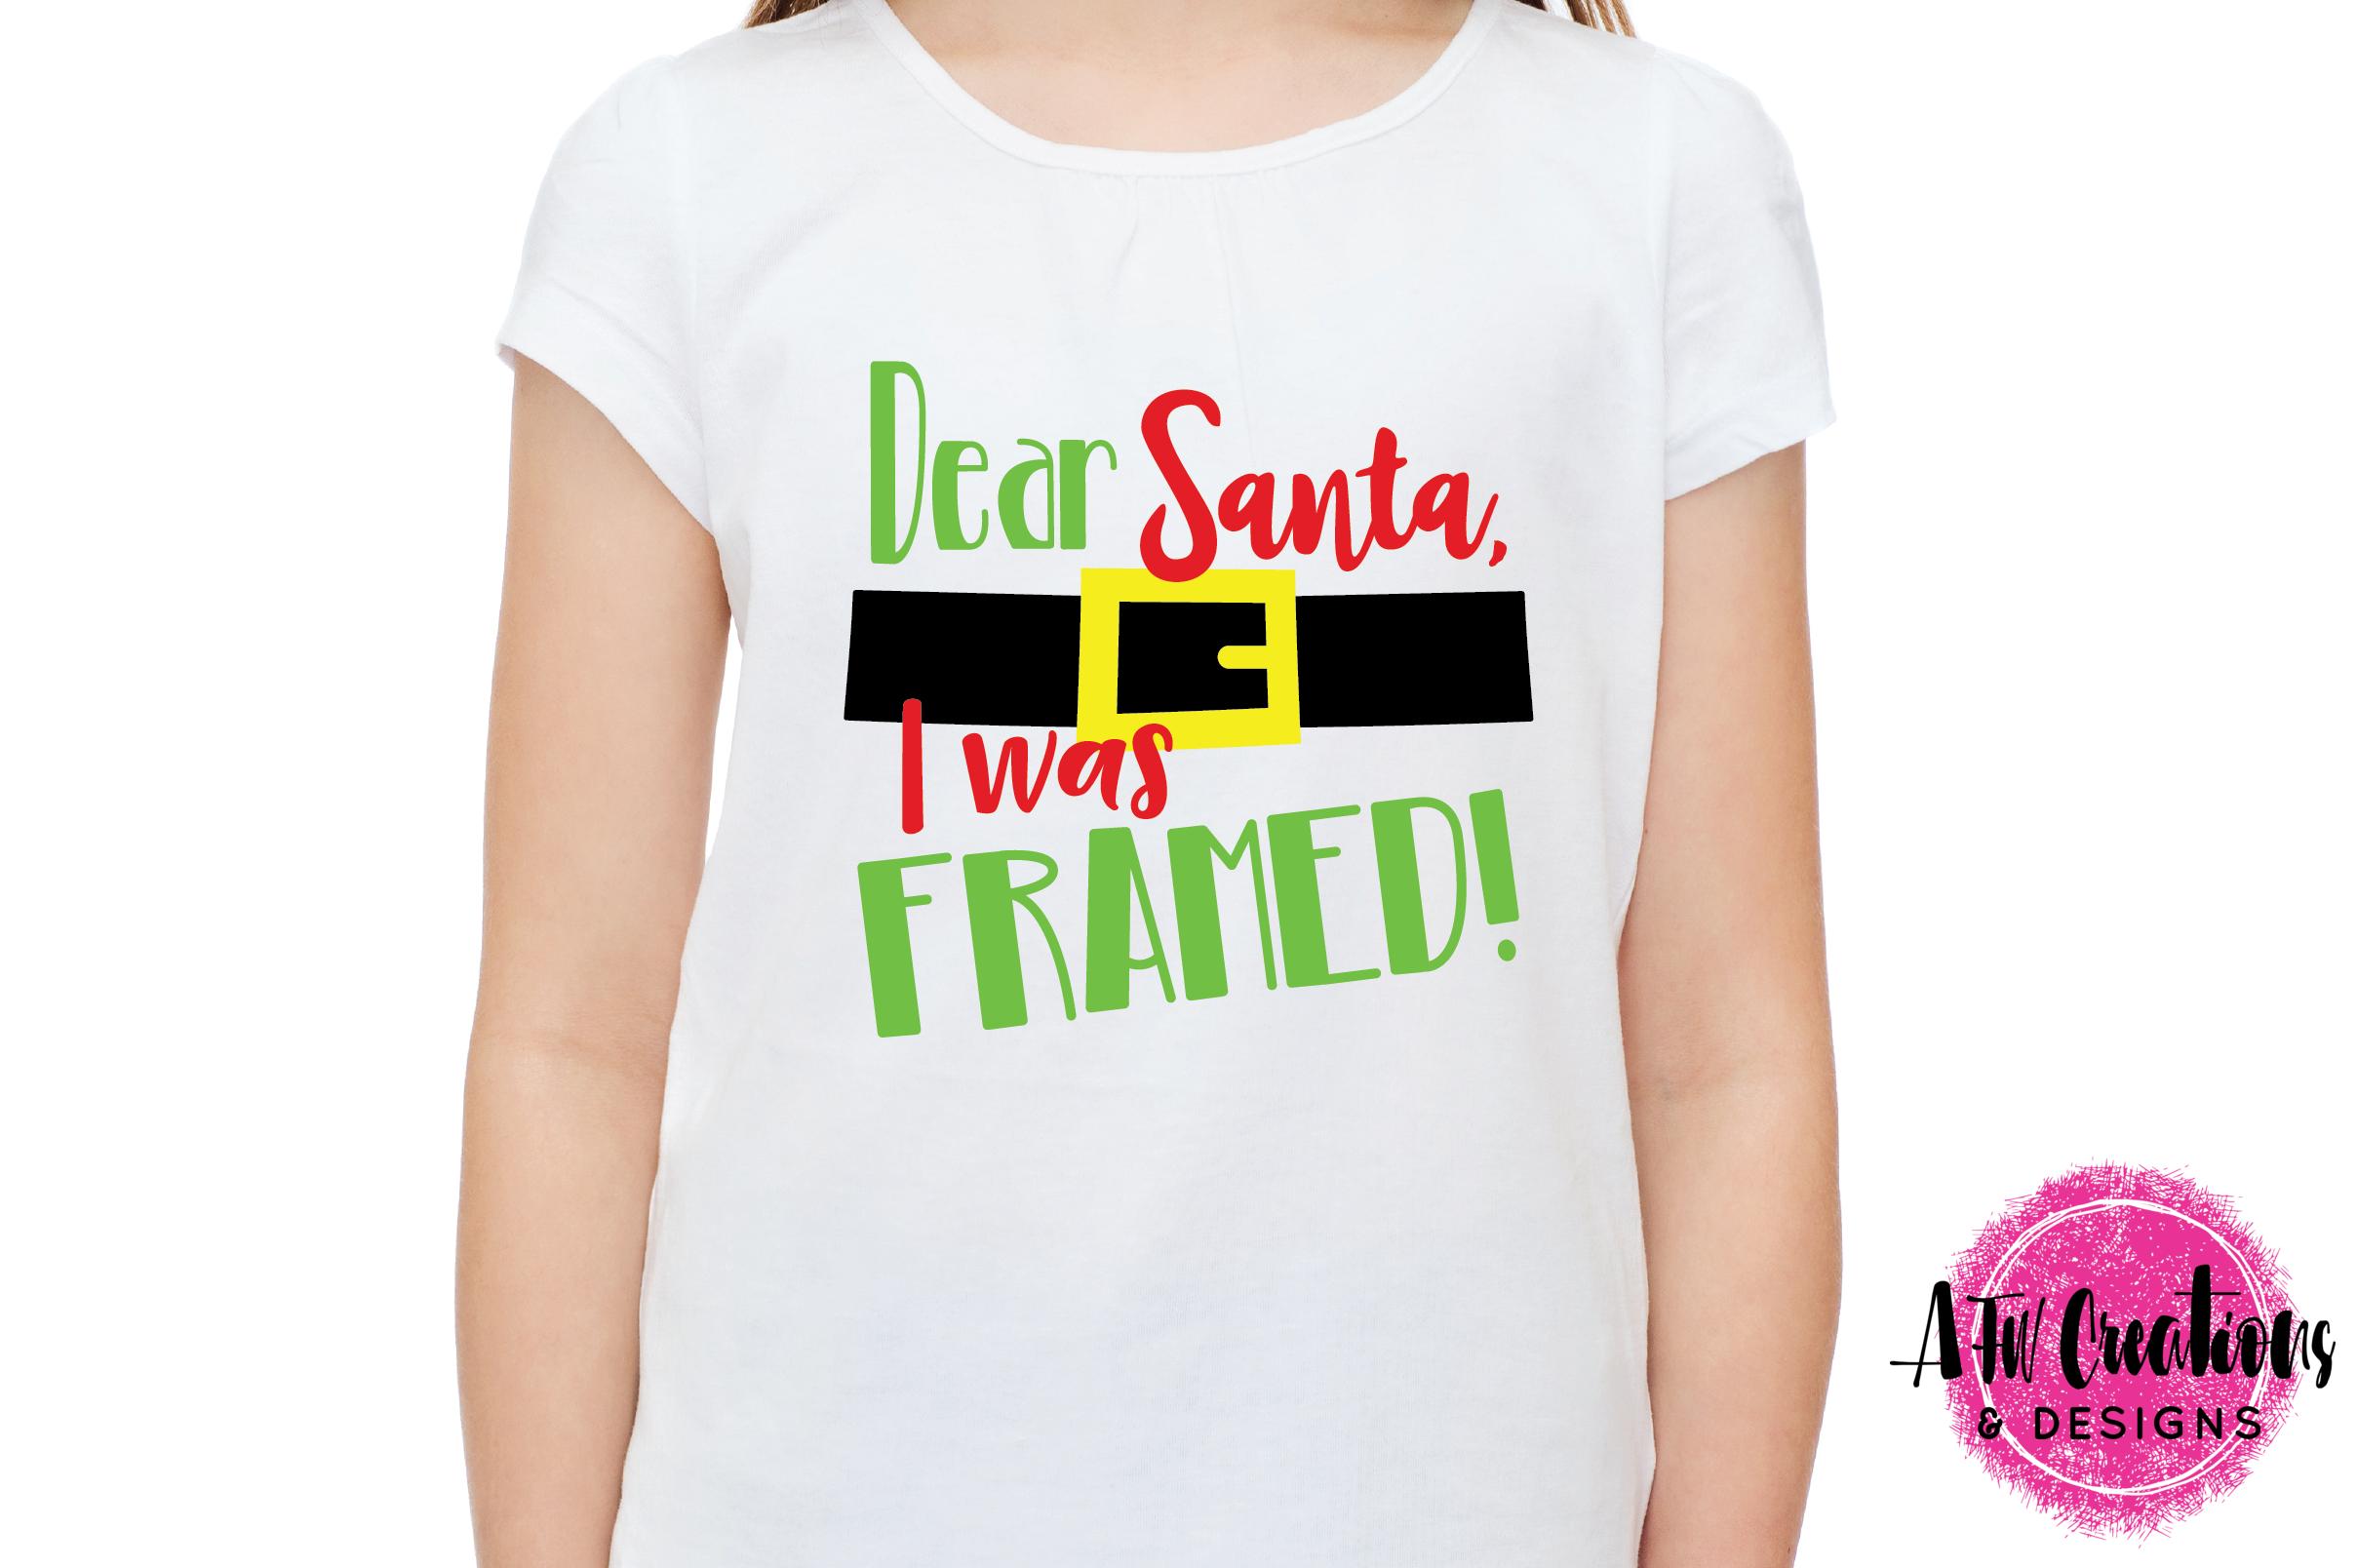 Dear Santa - I Was Framed - SVG, DXF, EPS Cut File example image 2